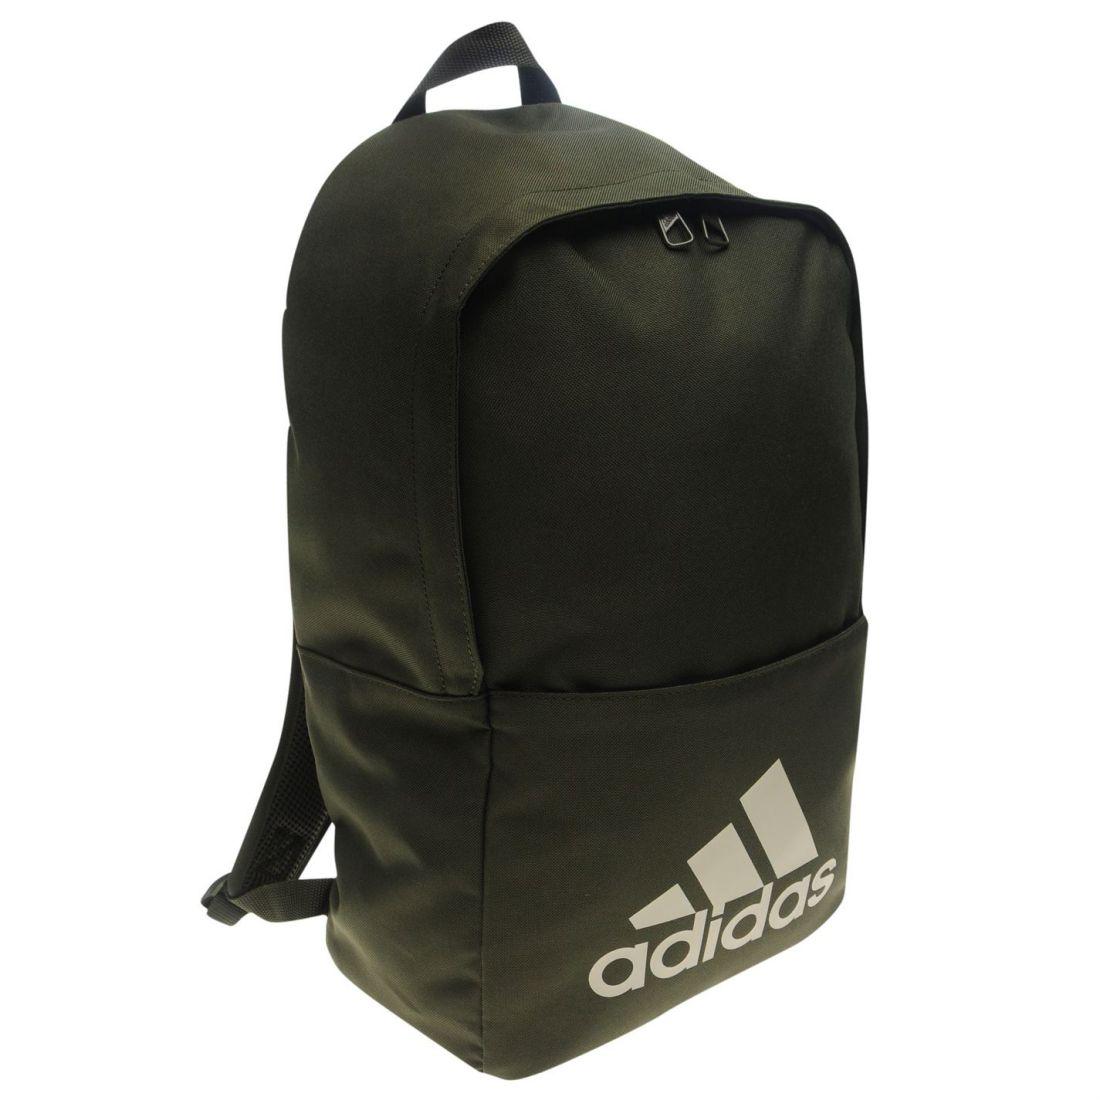 eb1586b080 adidas Classic Football Backpack Rucksack Sports School Gym Travel ...